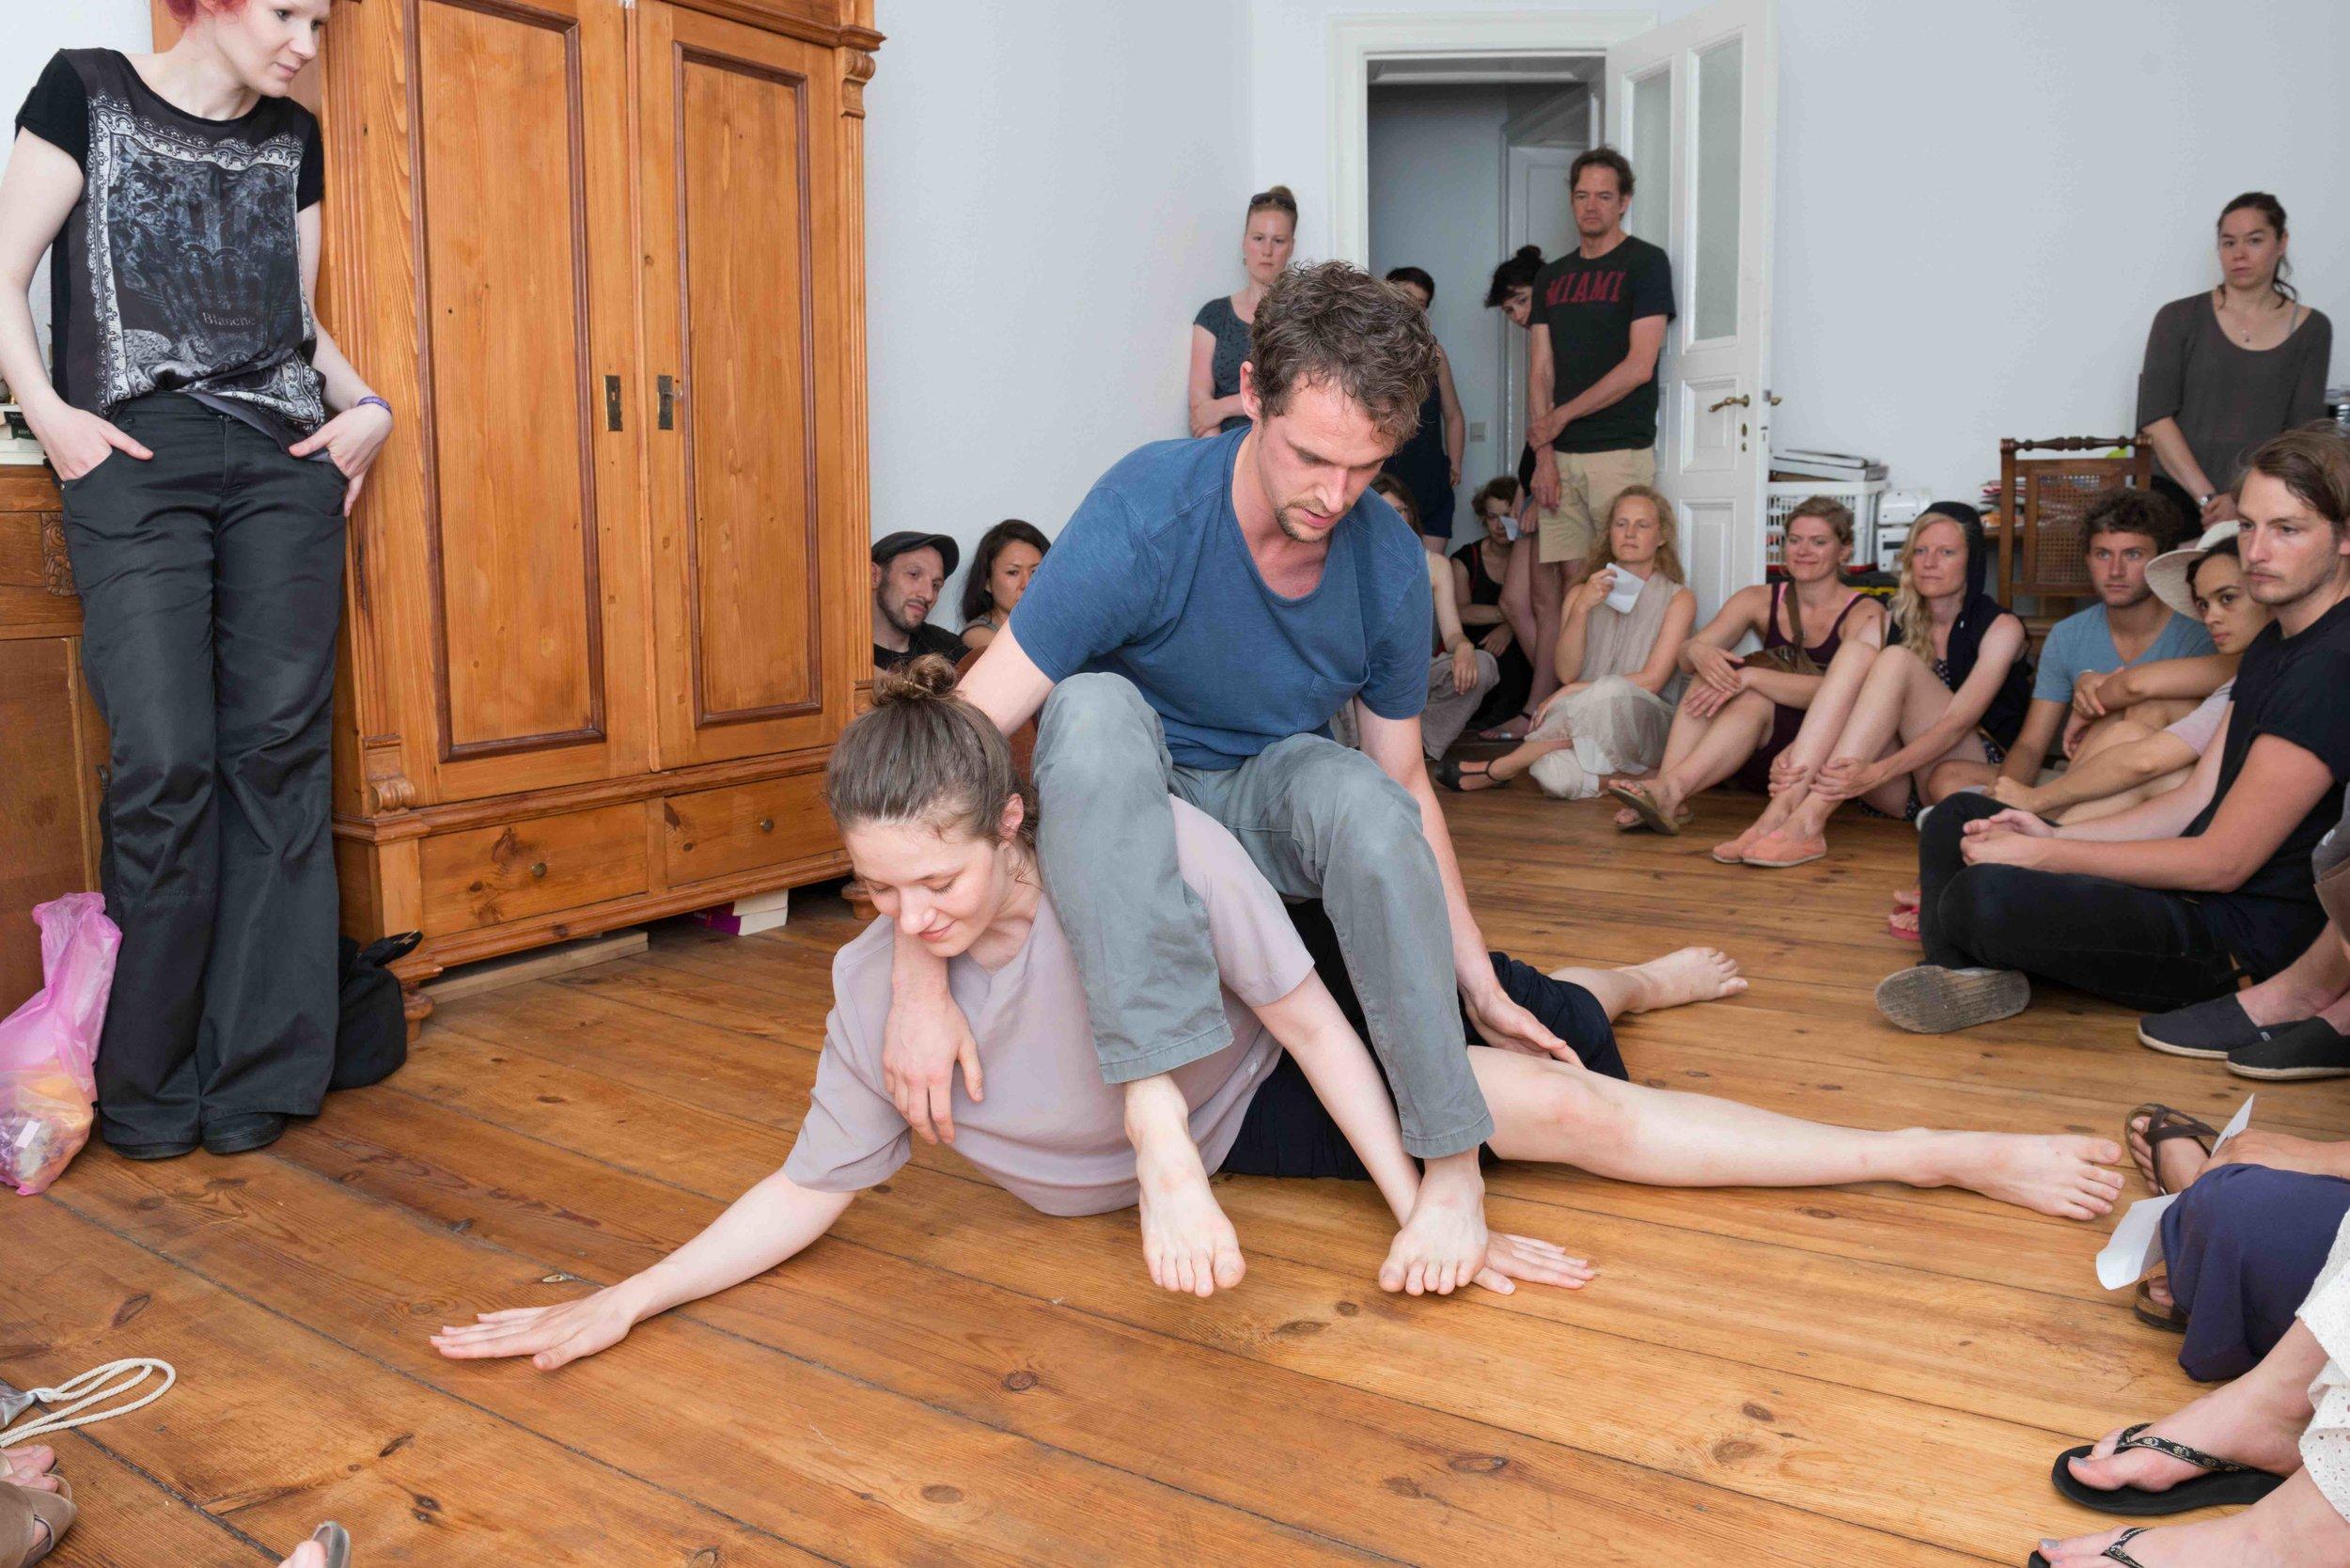 © Ines Borchart. dancers: Leah Marojević, Christopher Owen